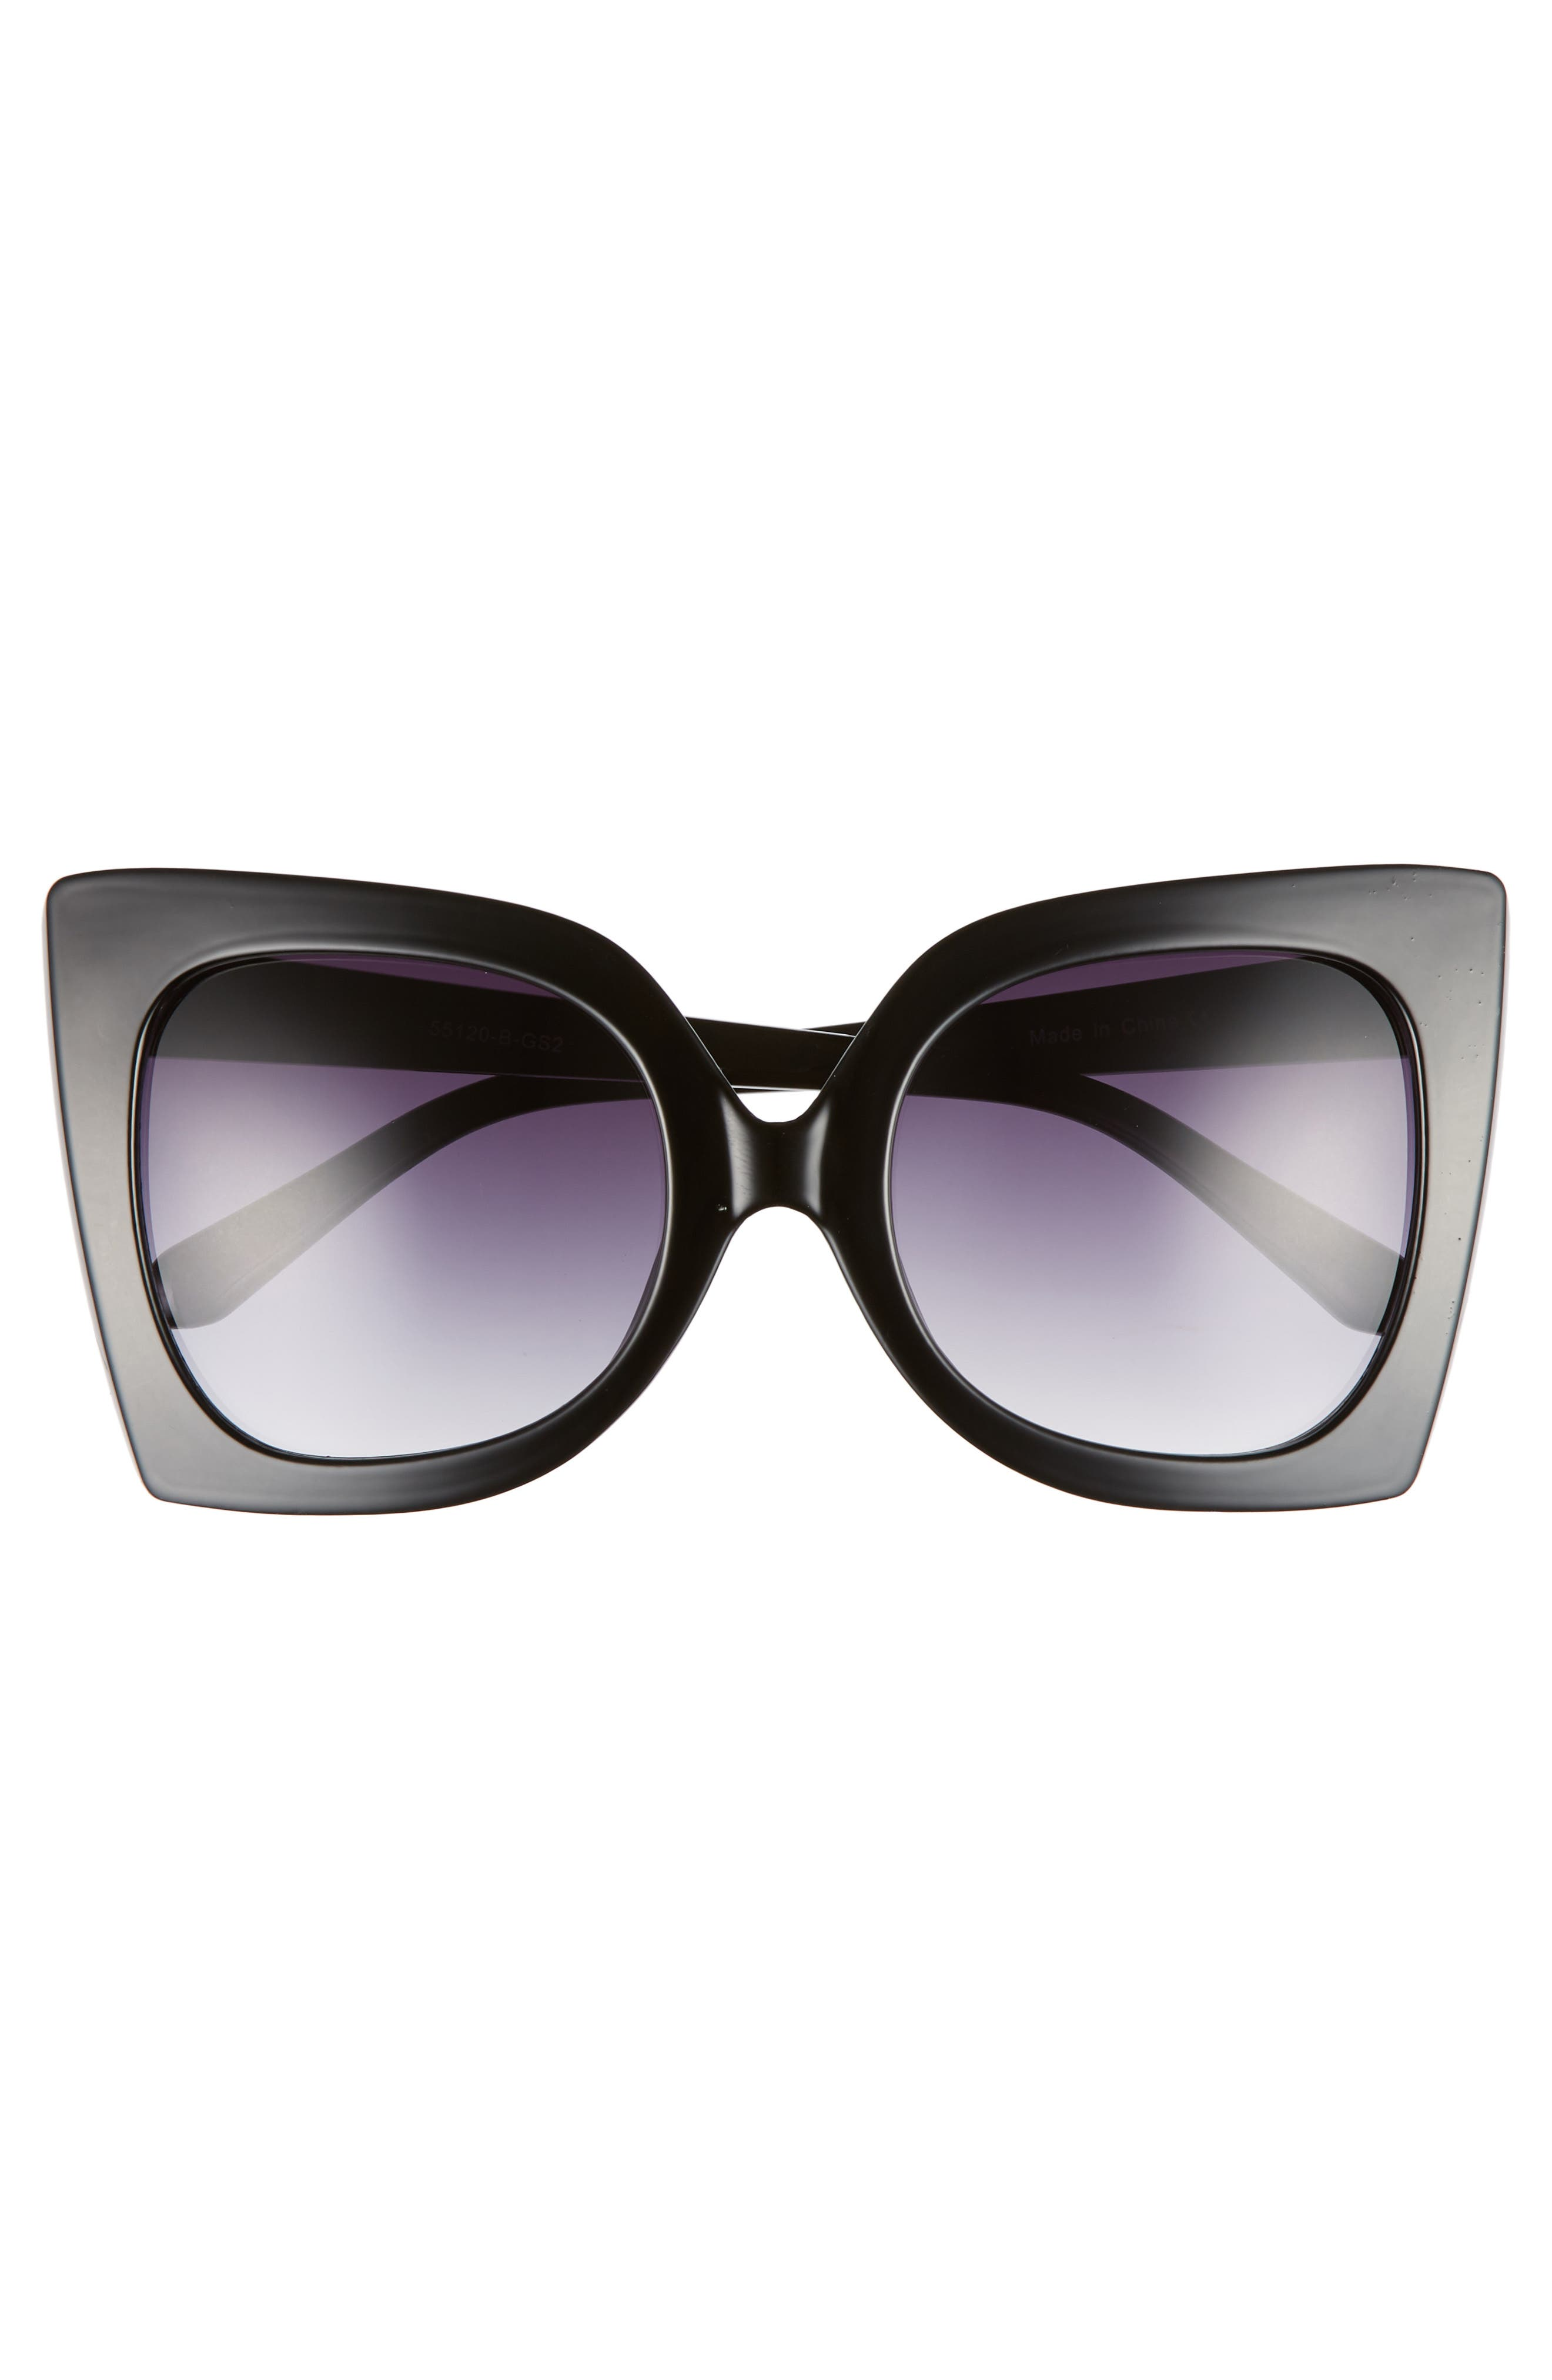 56mm Exaggerated Square Sunglasses,                             Alternate thumbnail 3, color,                             Black